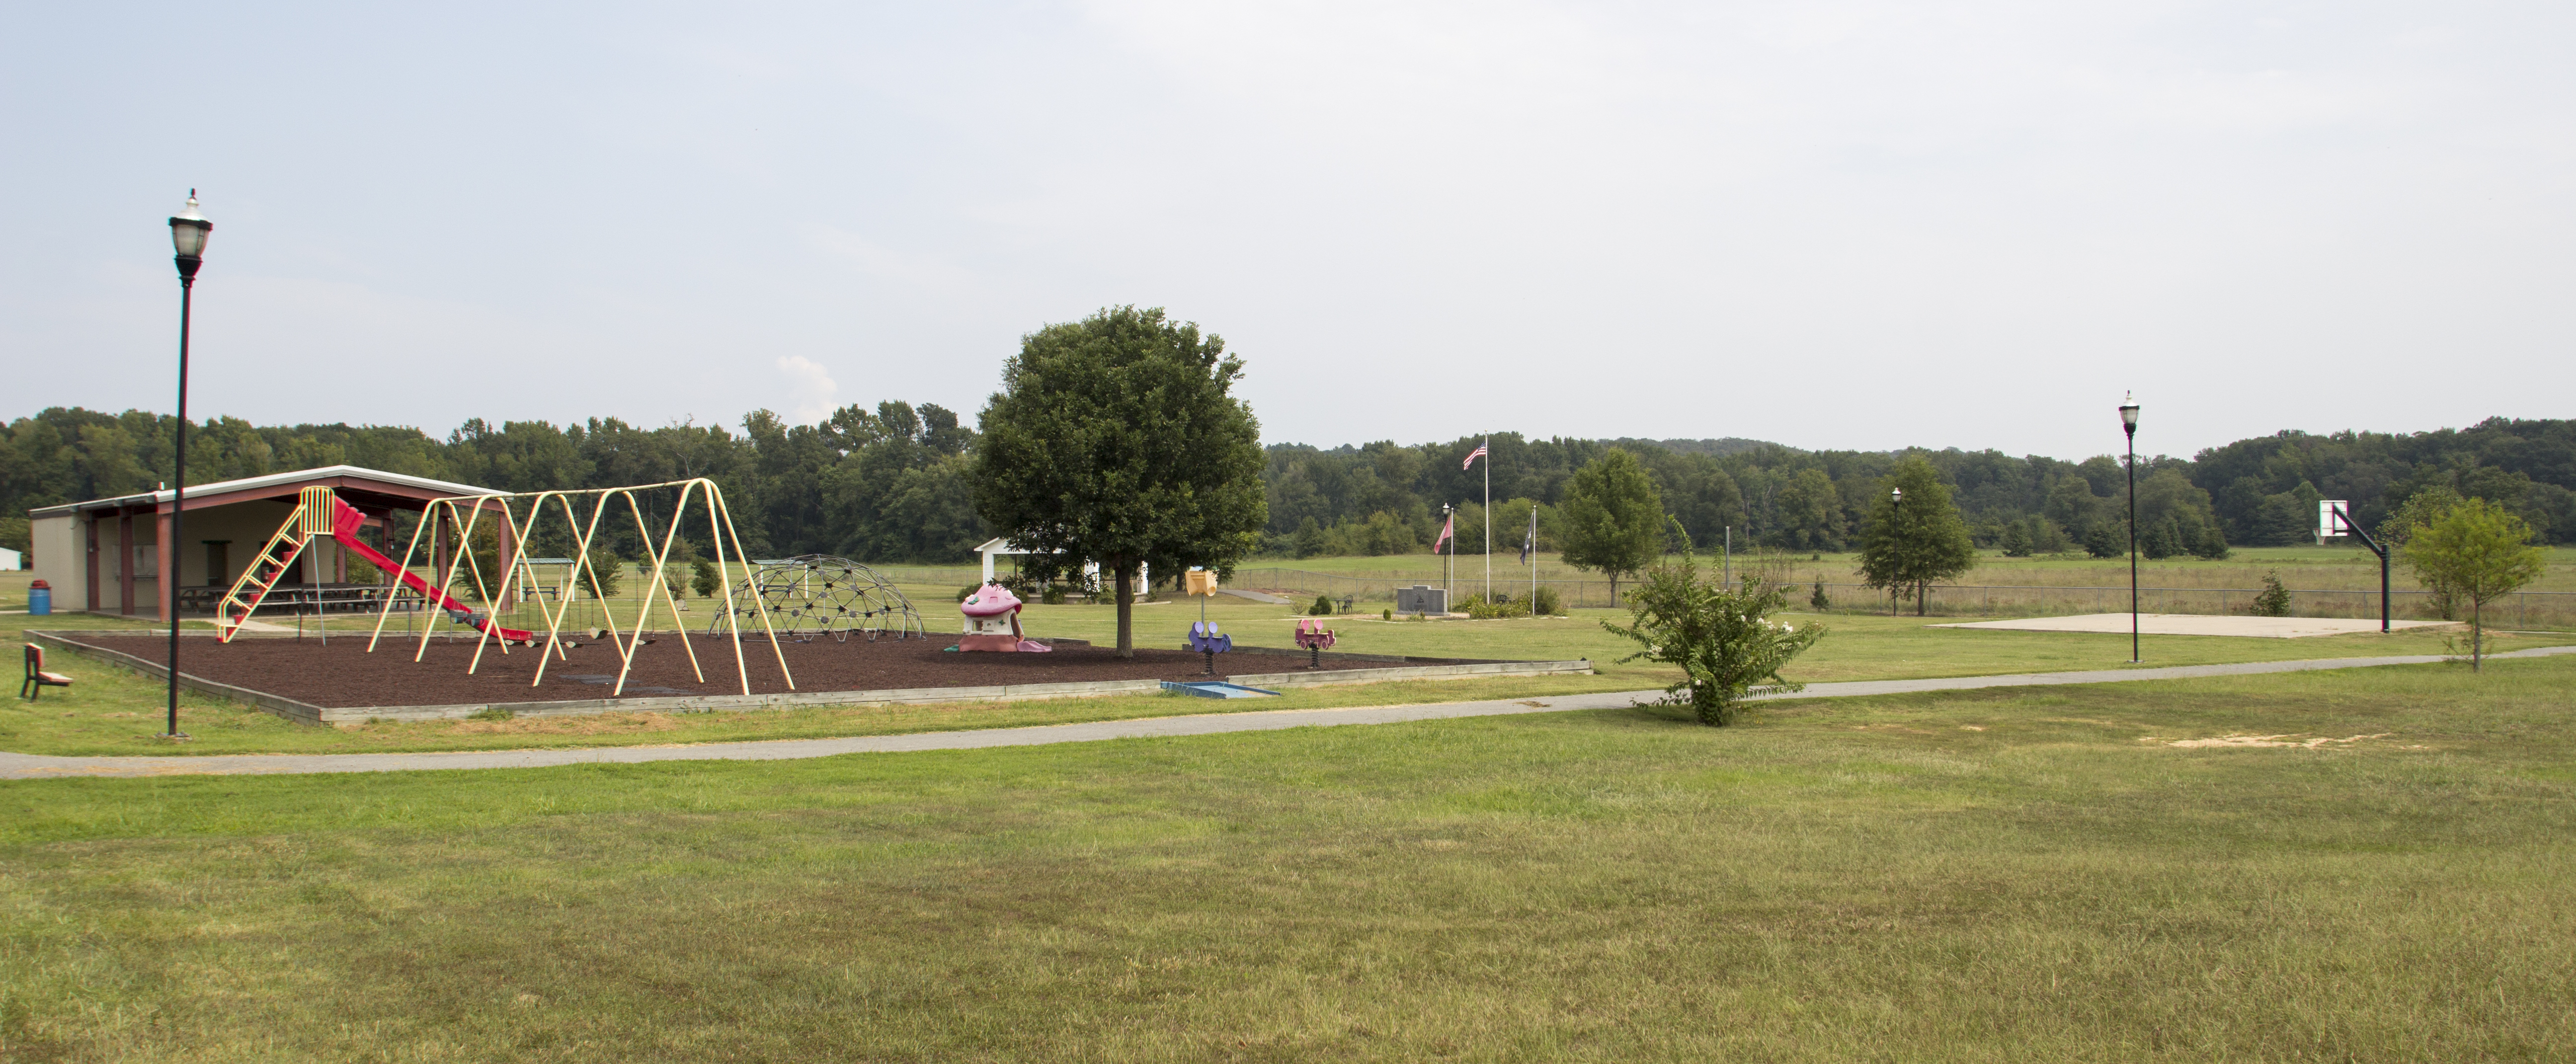 Wooster City Park